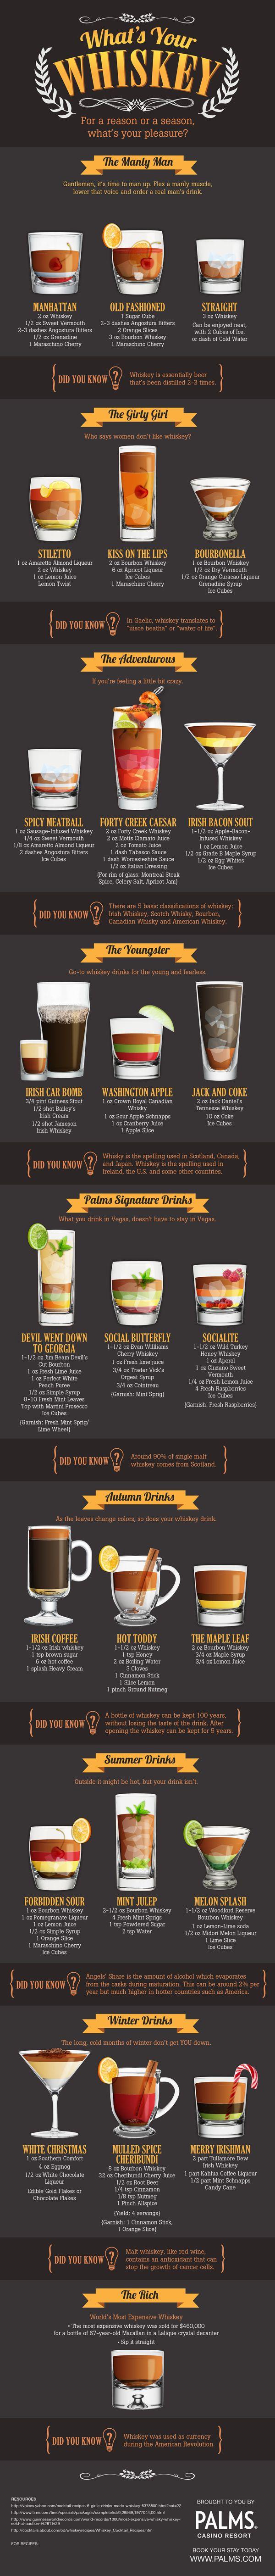 Palm's Casino Resort Whiskey Infographic by Pam Brown {dezinegirl}, via Behance